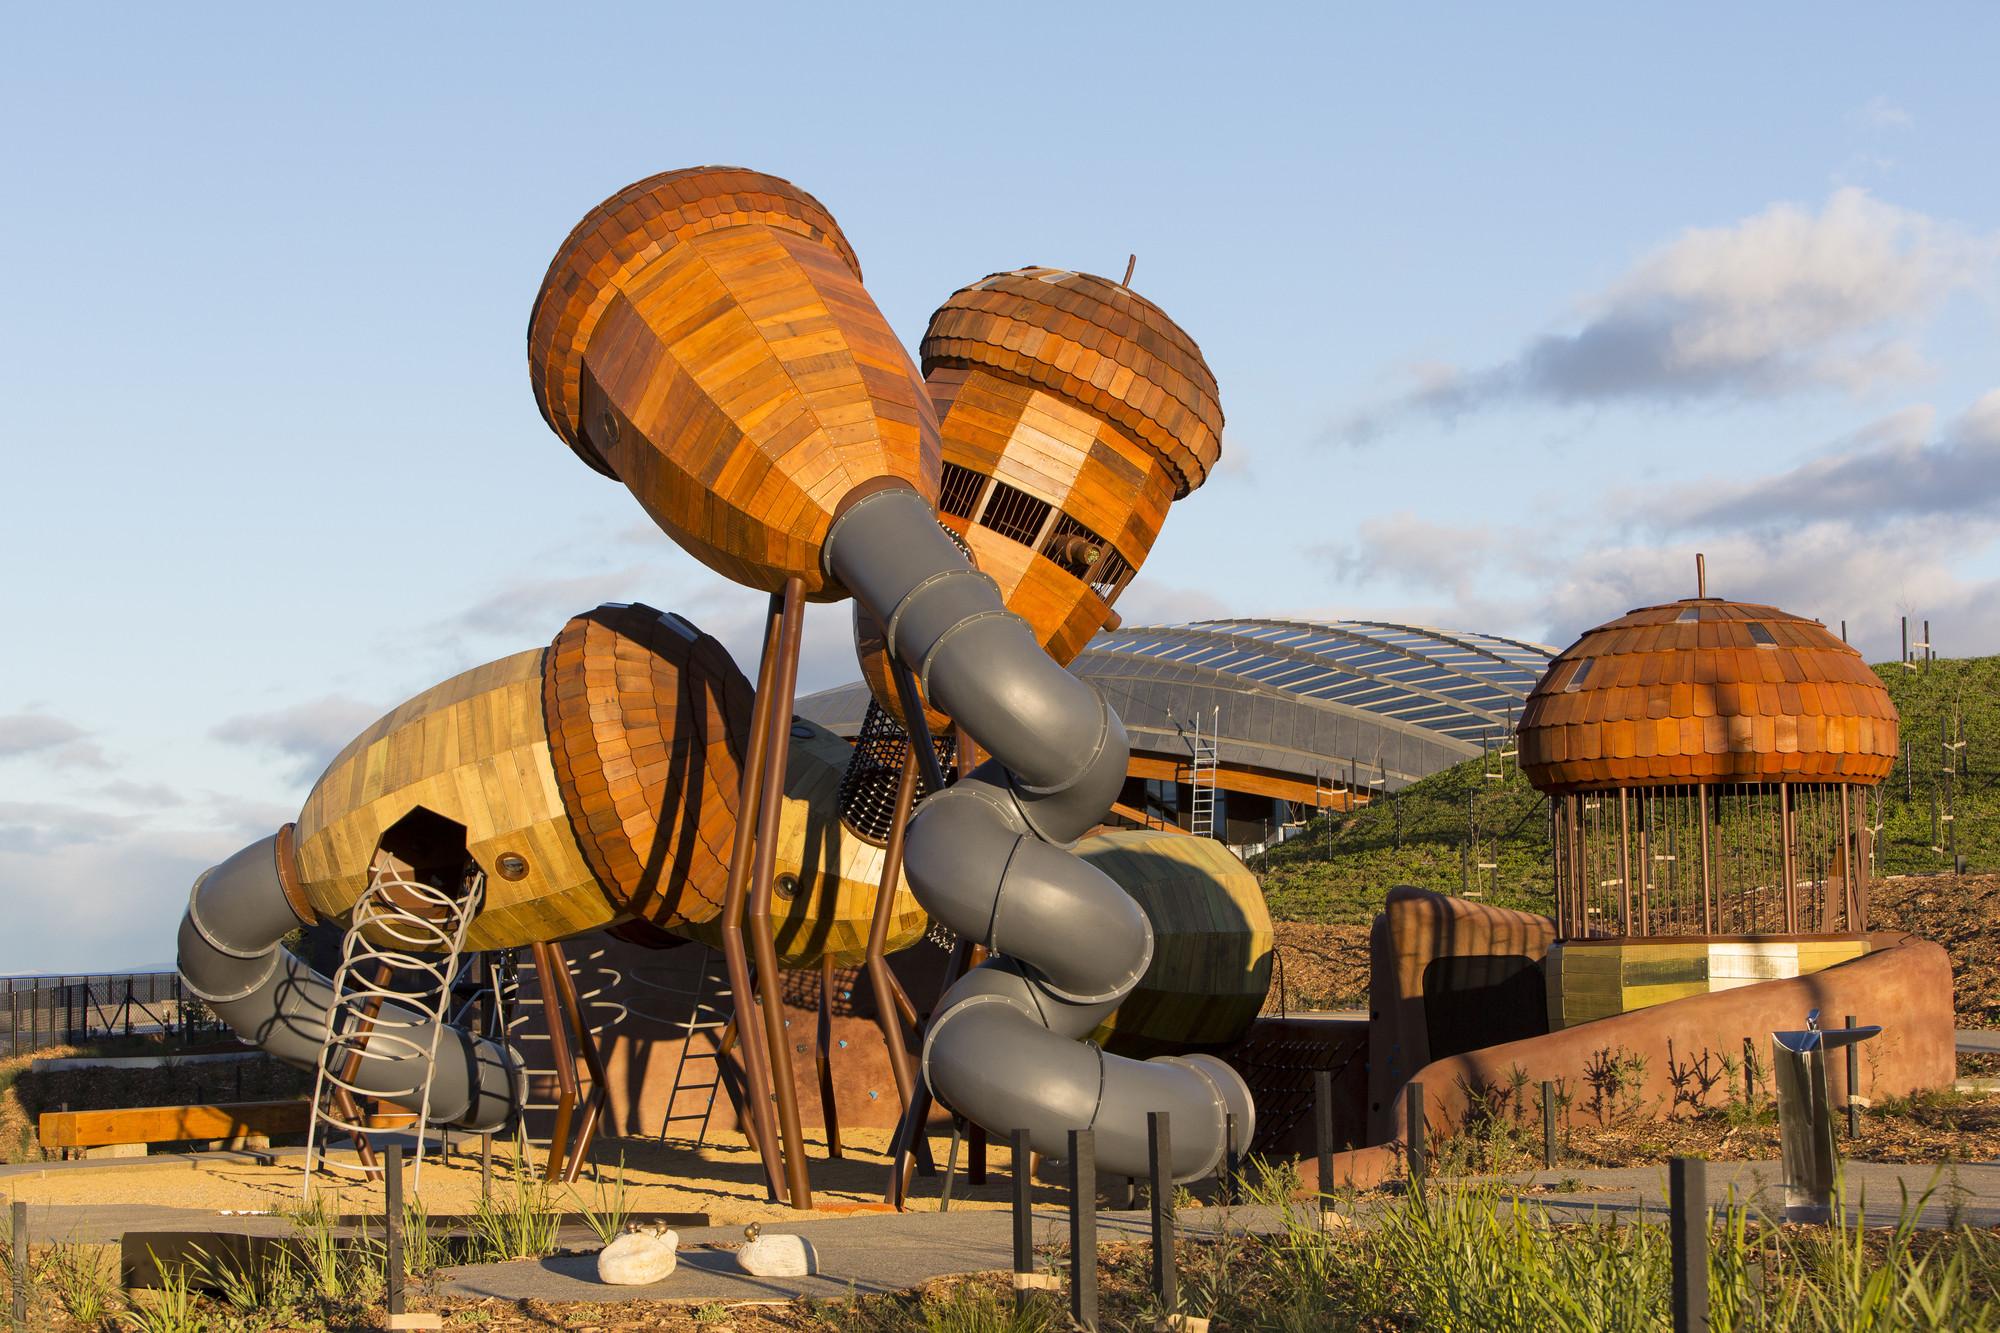 Instituto Australiano de Arquitetos anuncia vencedores do Prêmio ACT 2014, Sir John Overall Award for Urban Design – ARBORETUM de Tonkin Zulaikha Greer eTaylor Cullity Lethlean. Imagem © Brett Boardman